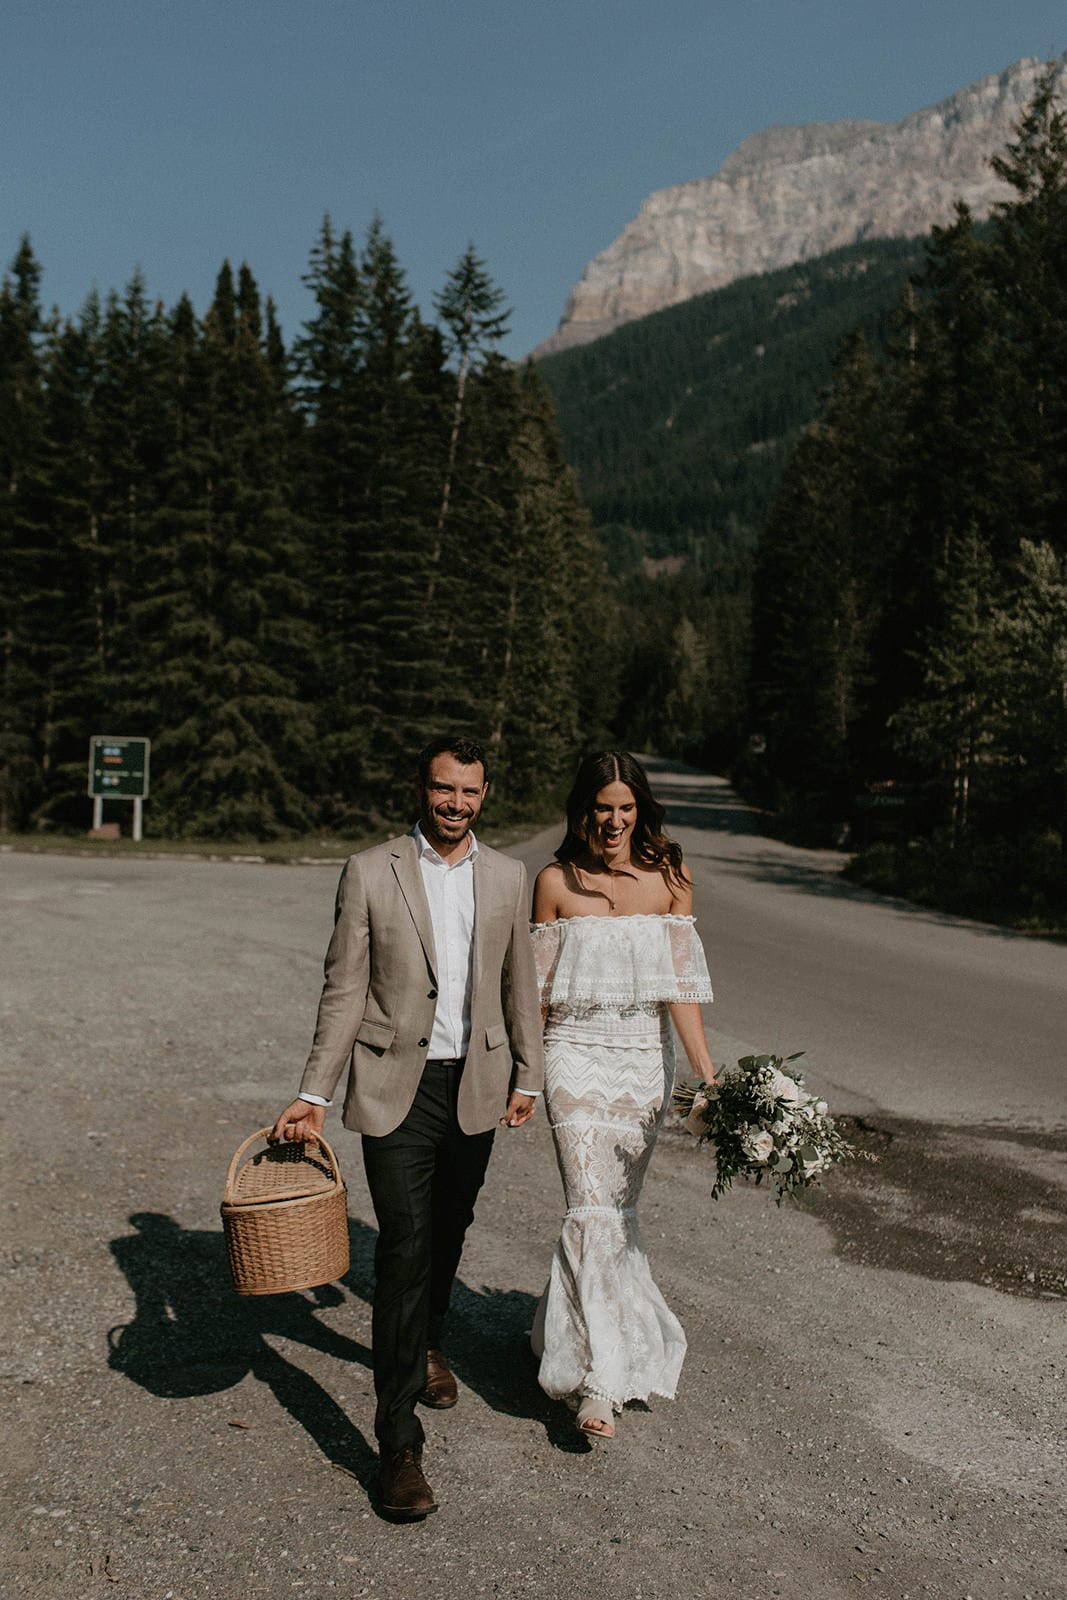 Brunette bride wearing Grace Loves Lace Emanuela Gown walking with groom down road